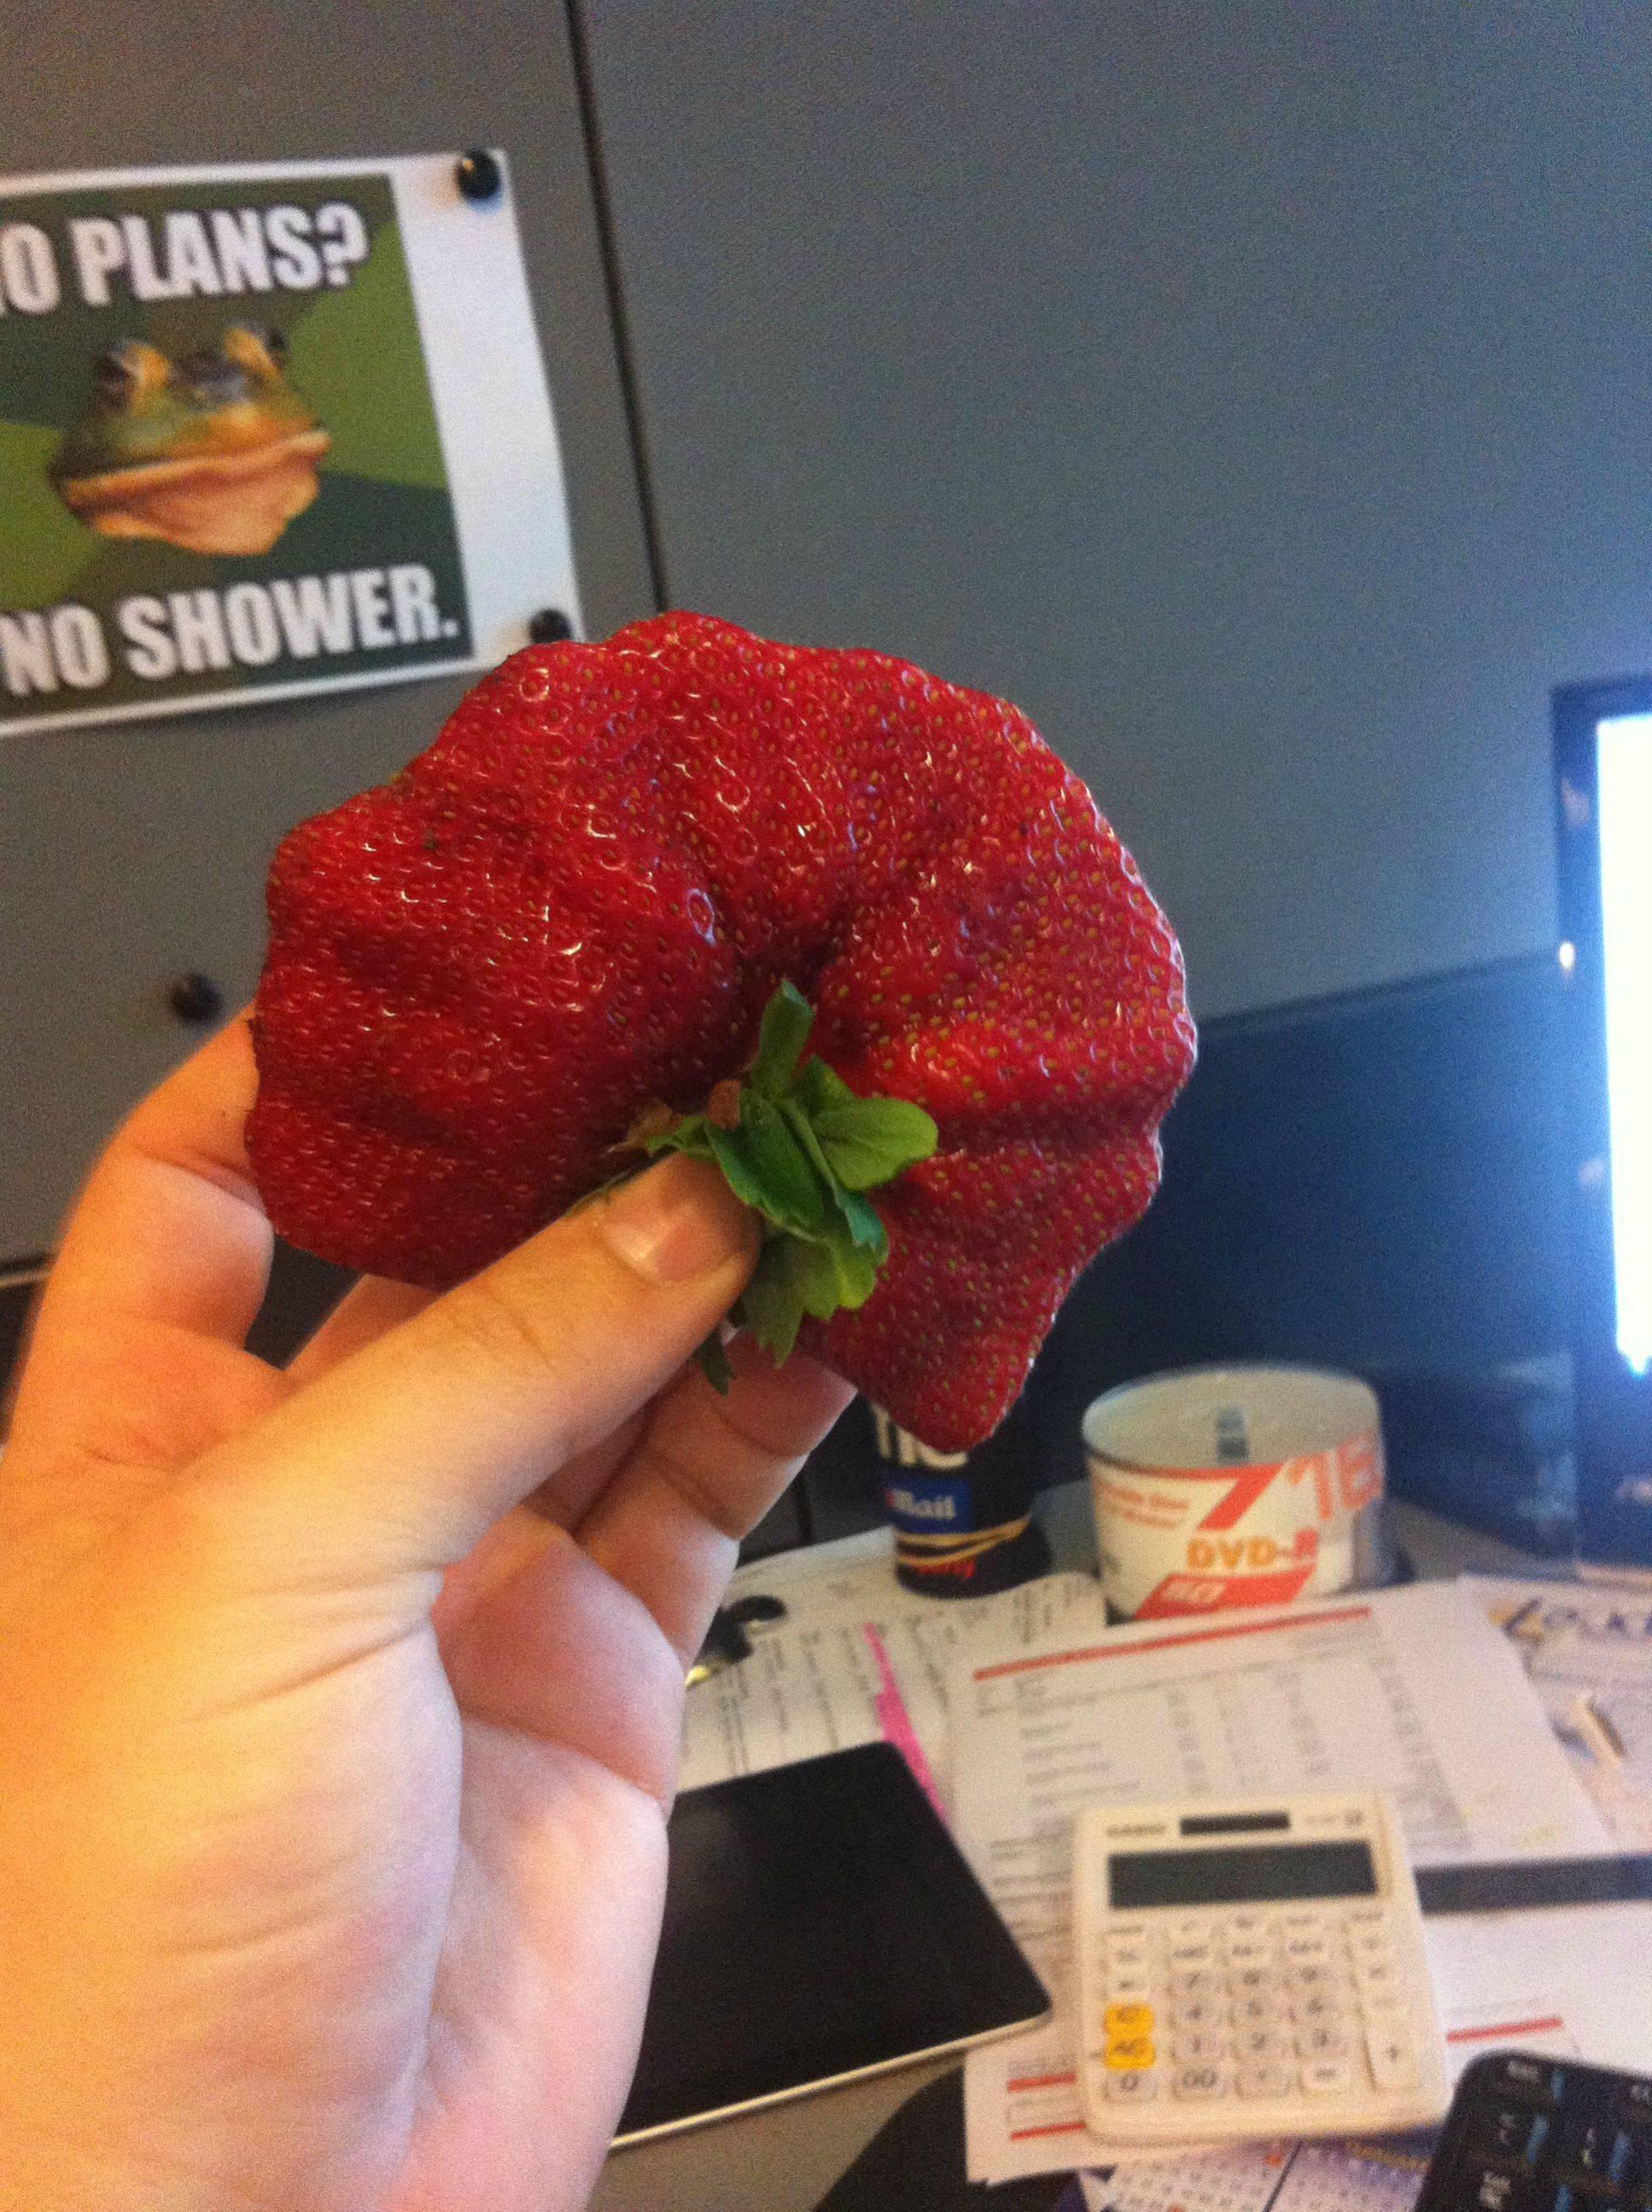 Biggest Strawbery EVER